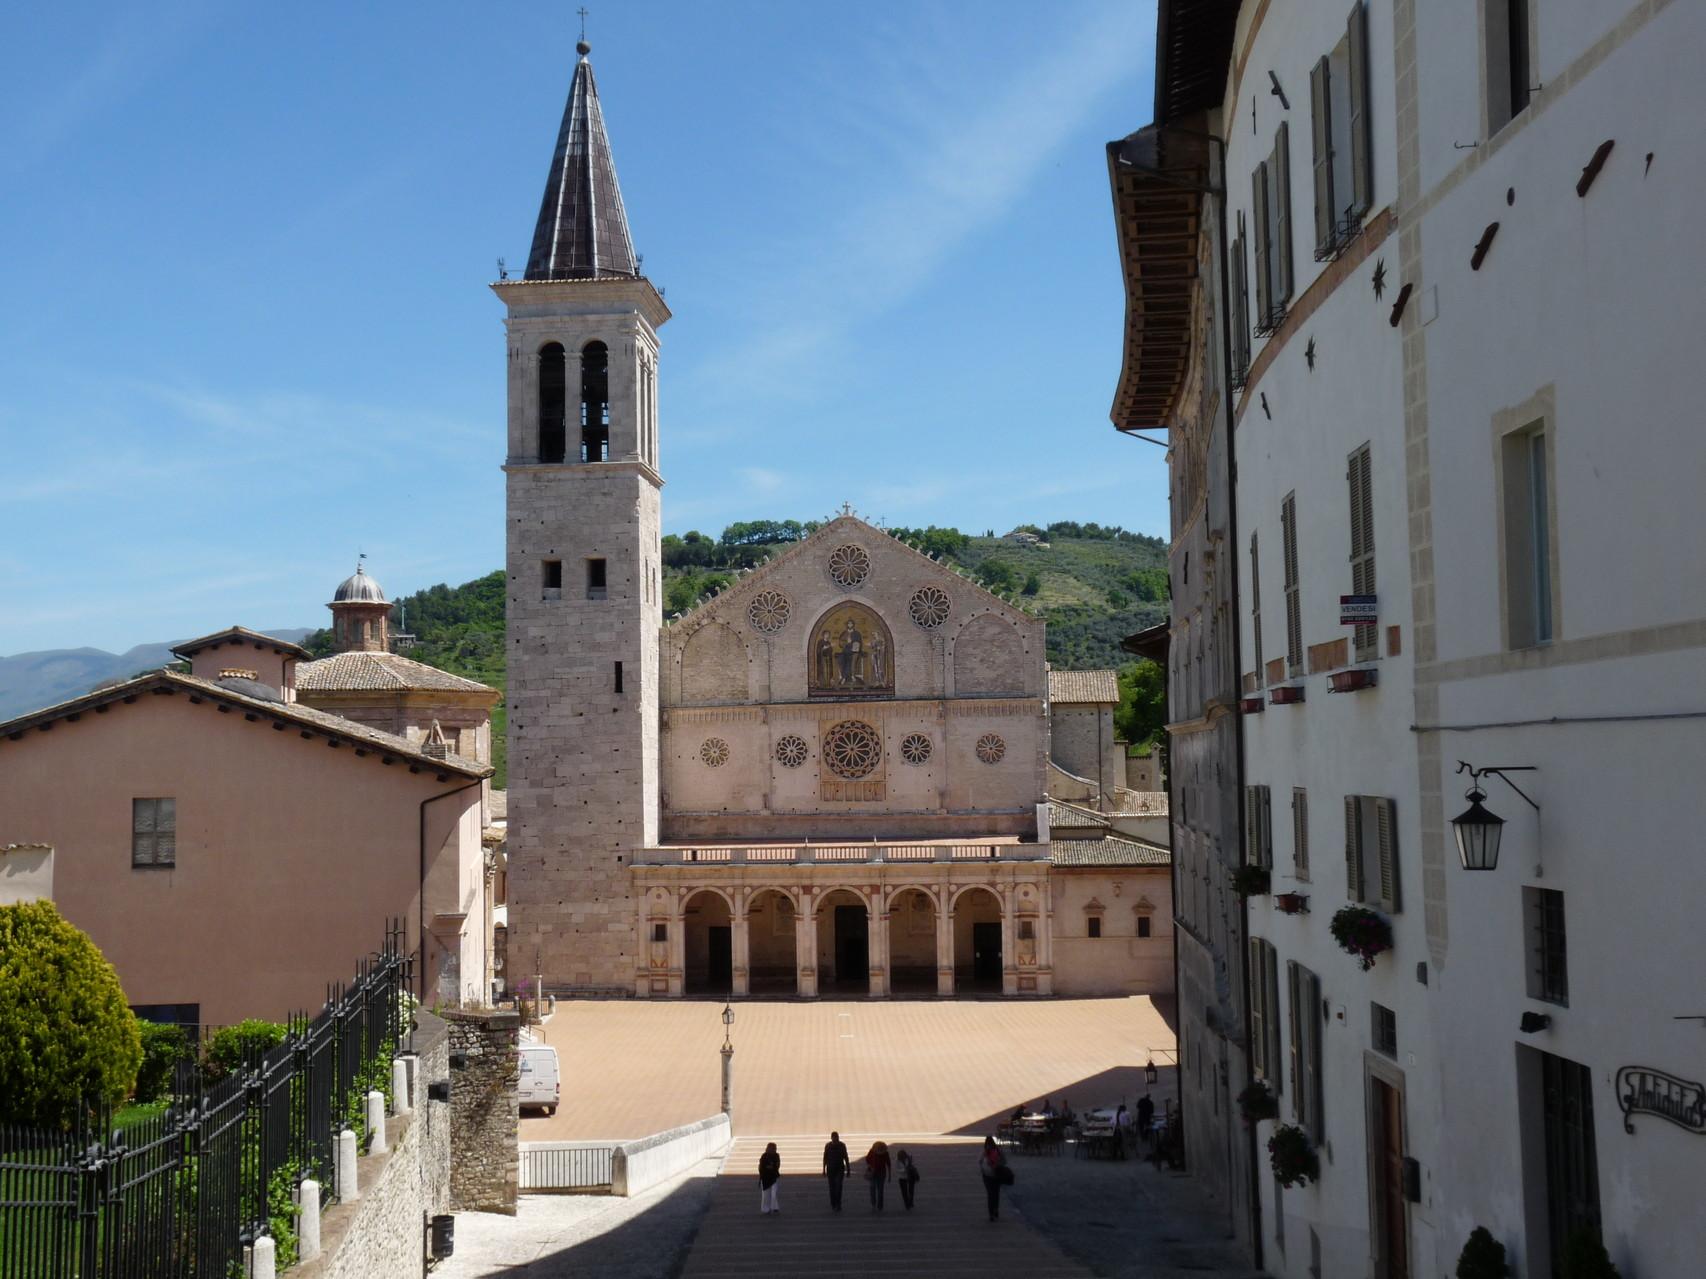 La cathédrale de Spoleto